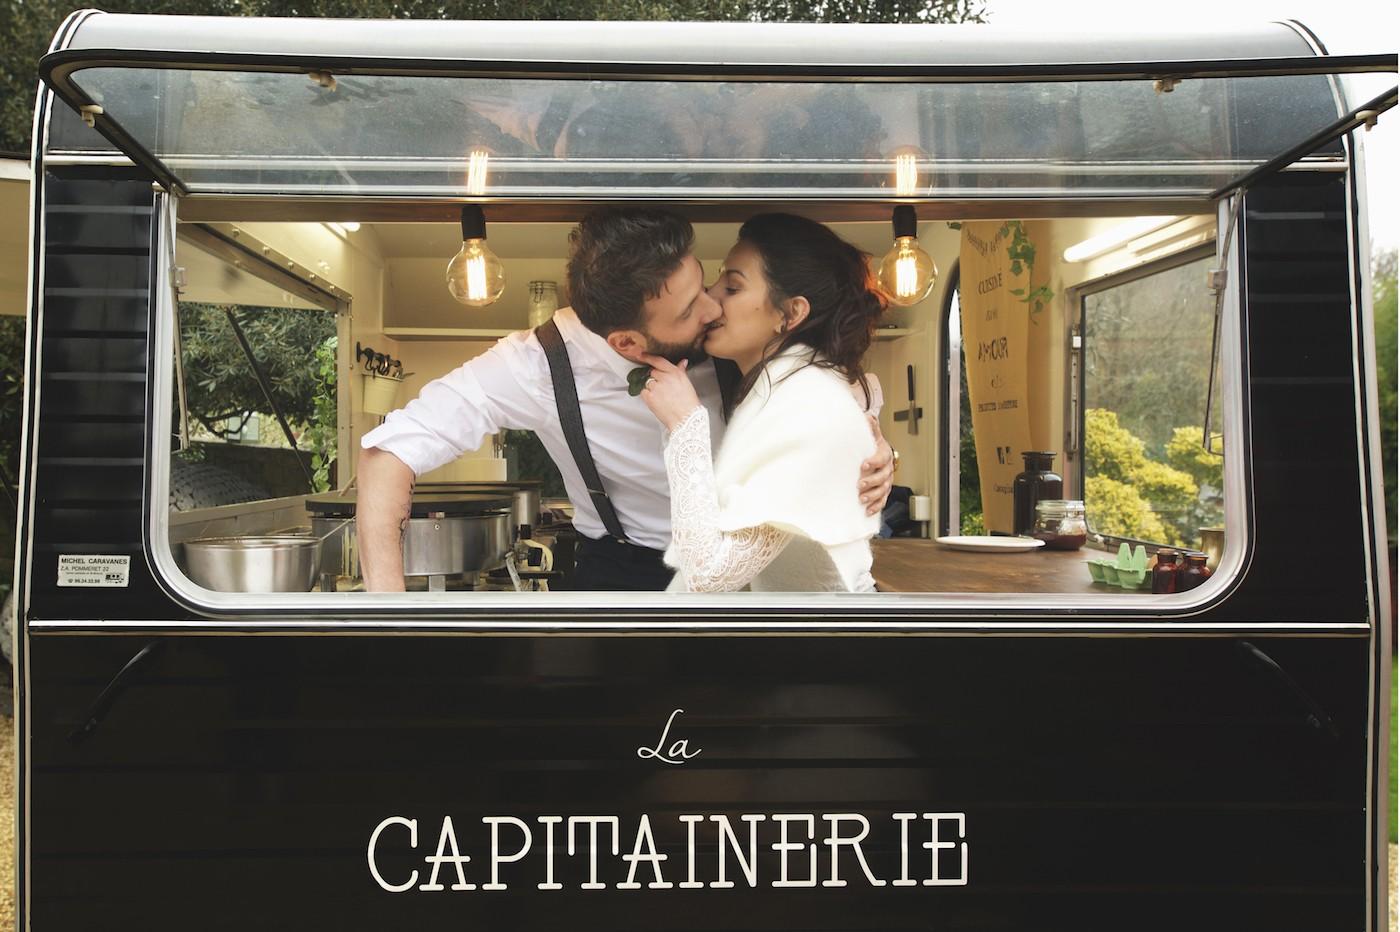 Food Truck La Capitainerie